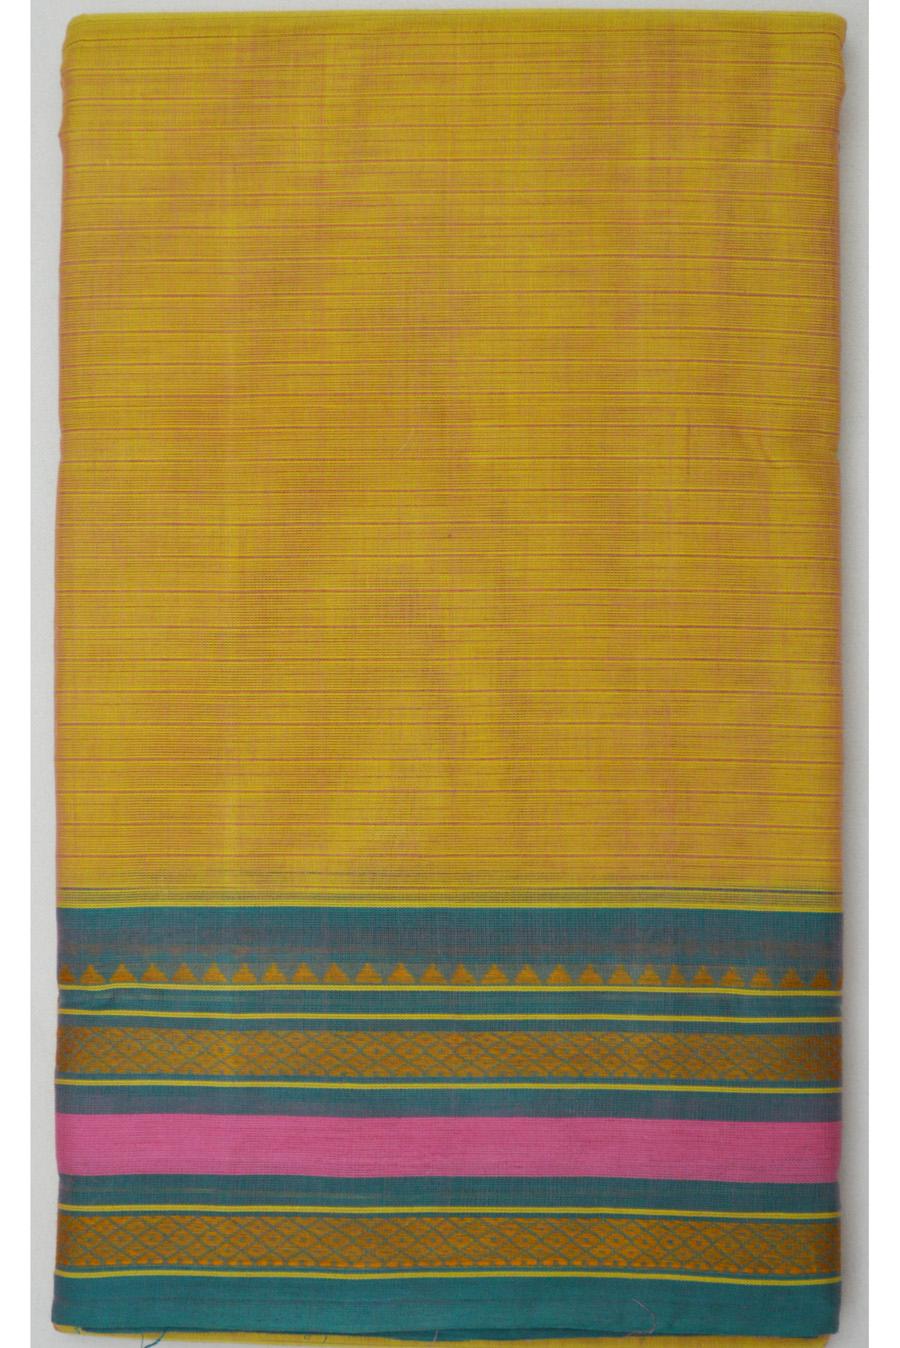 Kanchi Cotton 2739